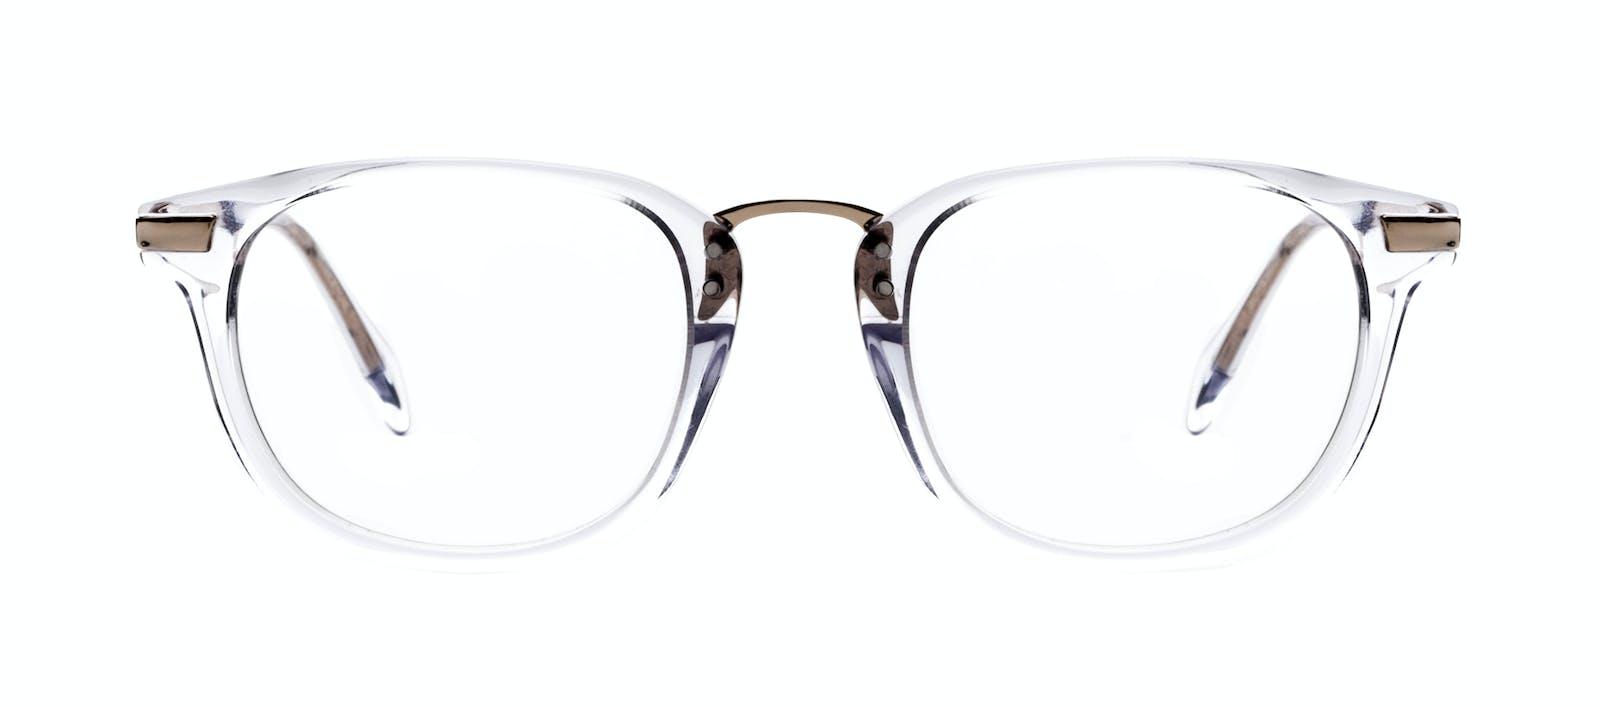 fb8d6595b4d Affordable Fashion Glasses Rectangle Square Eyeglasses Men Daze Gold  Diamond Front